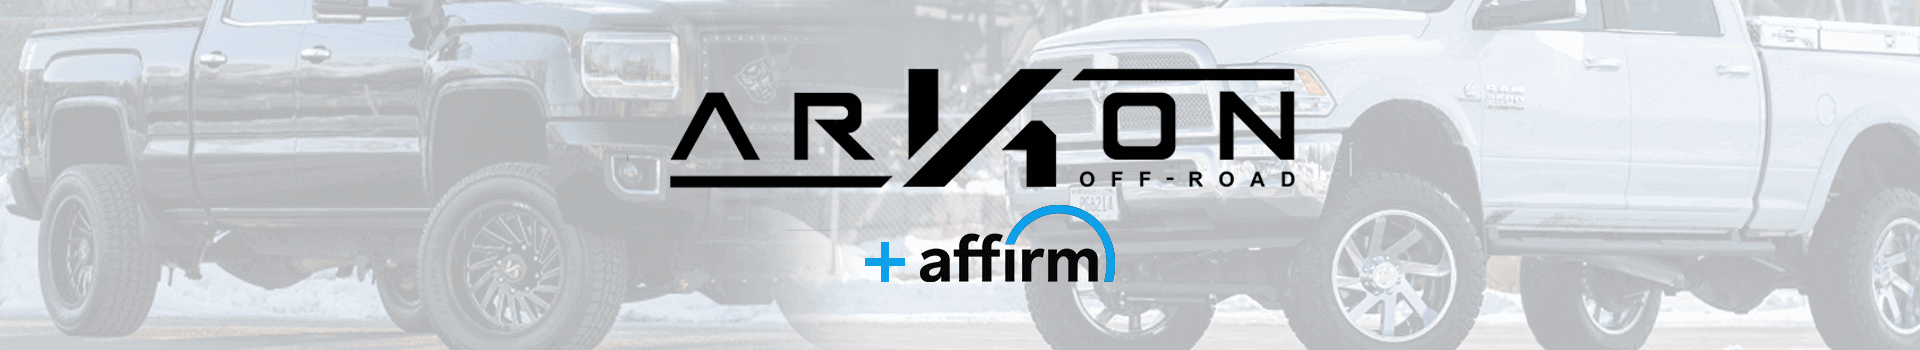 ARKON OFF-ROAD offers financing through Affirm